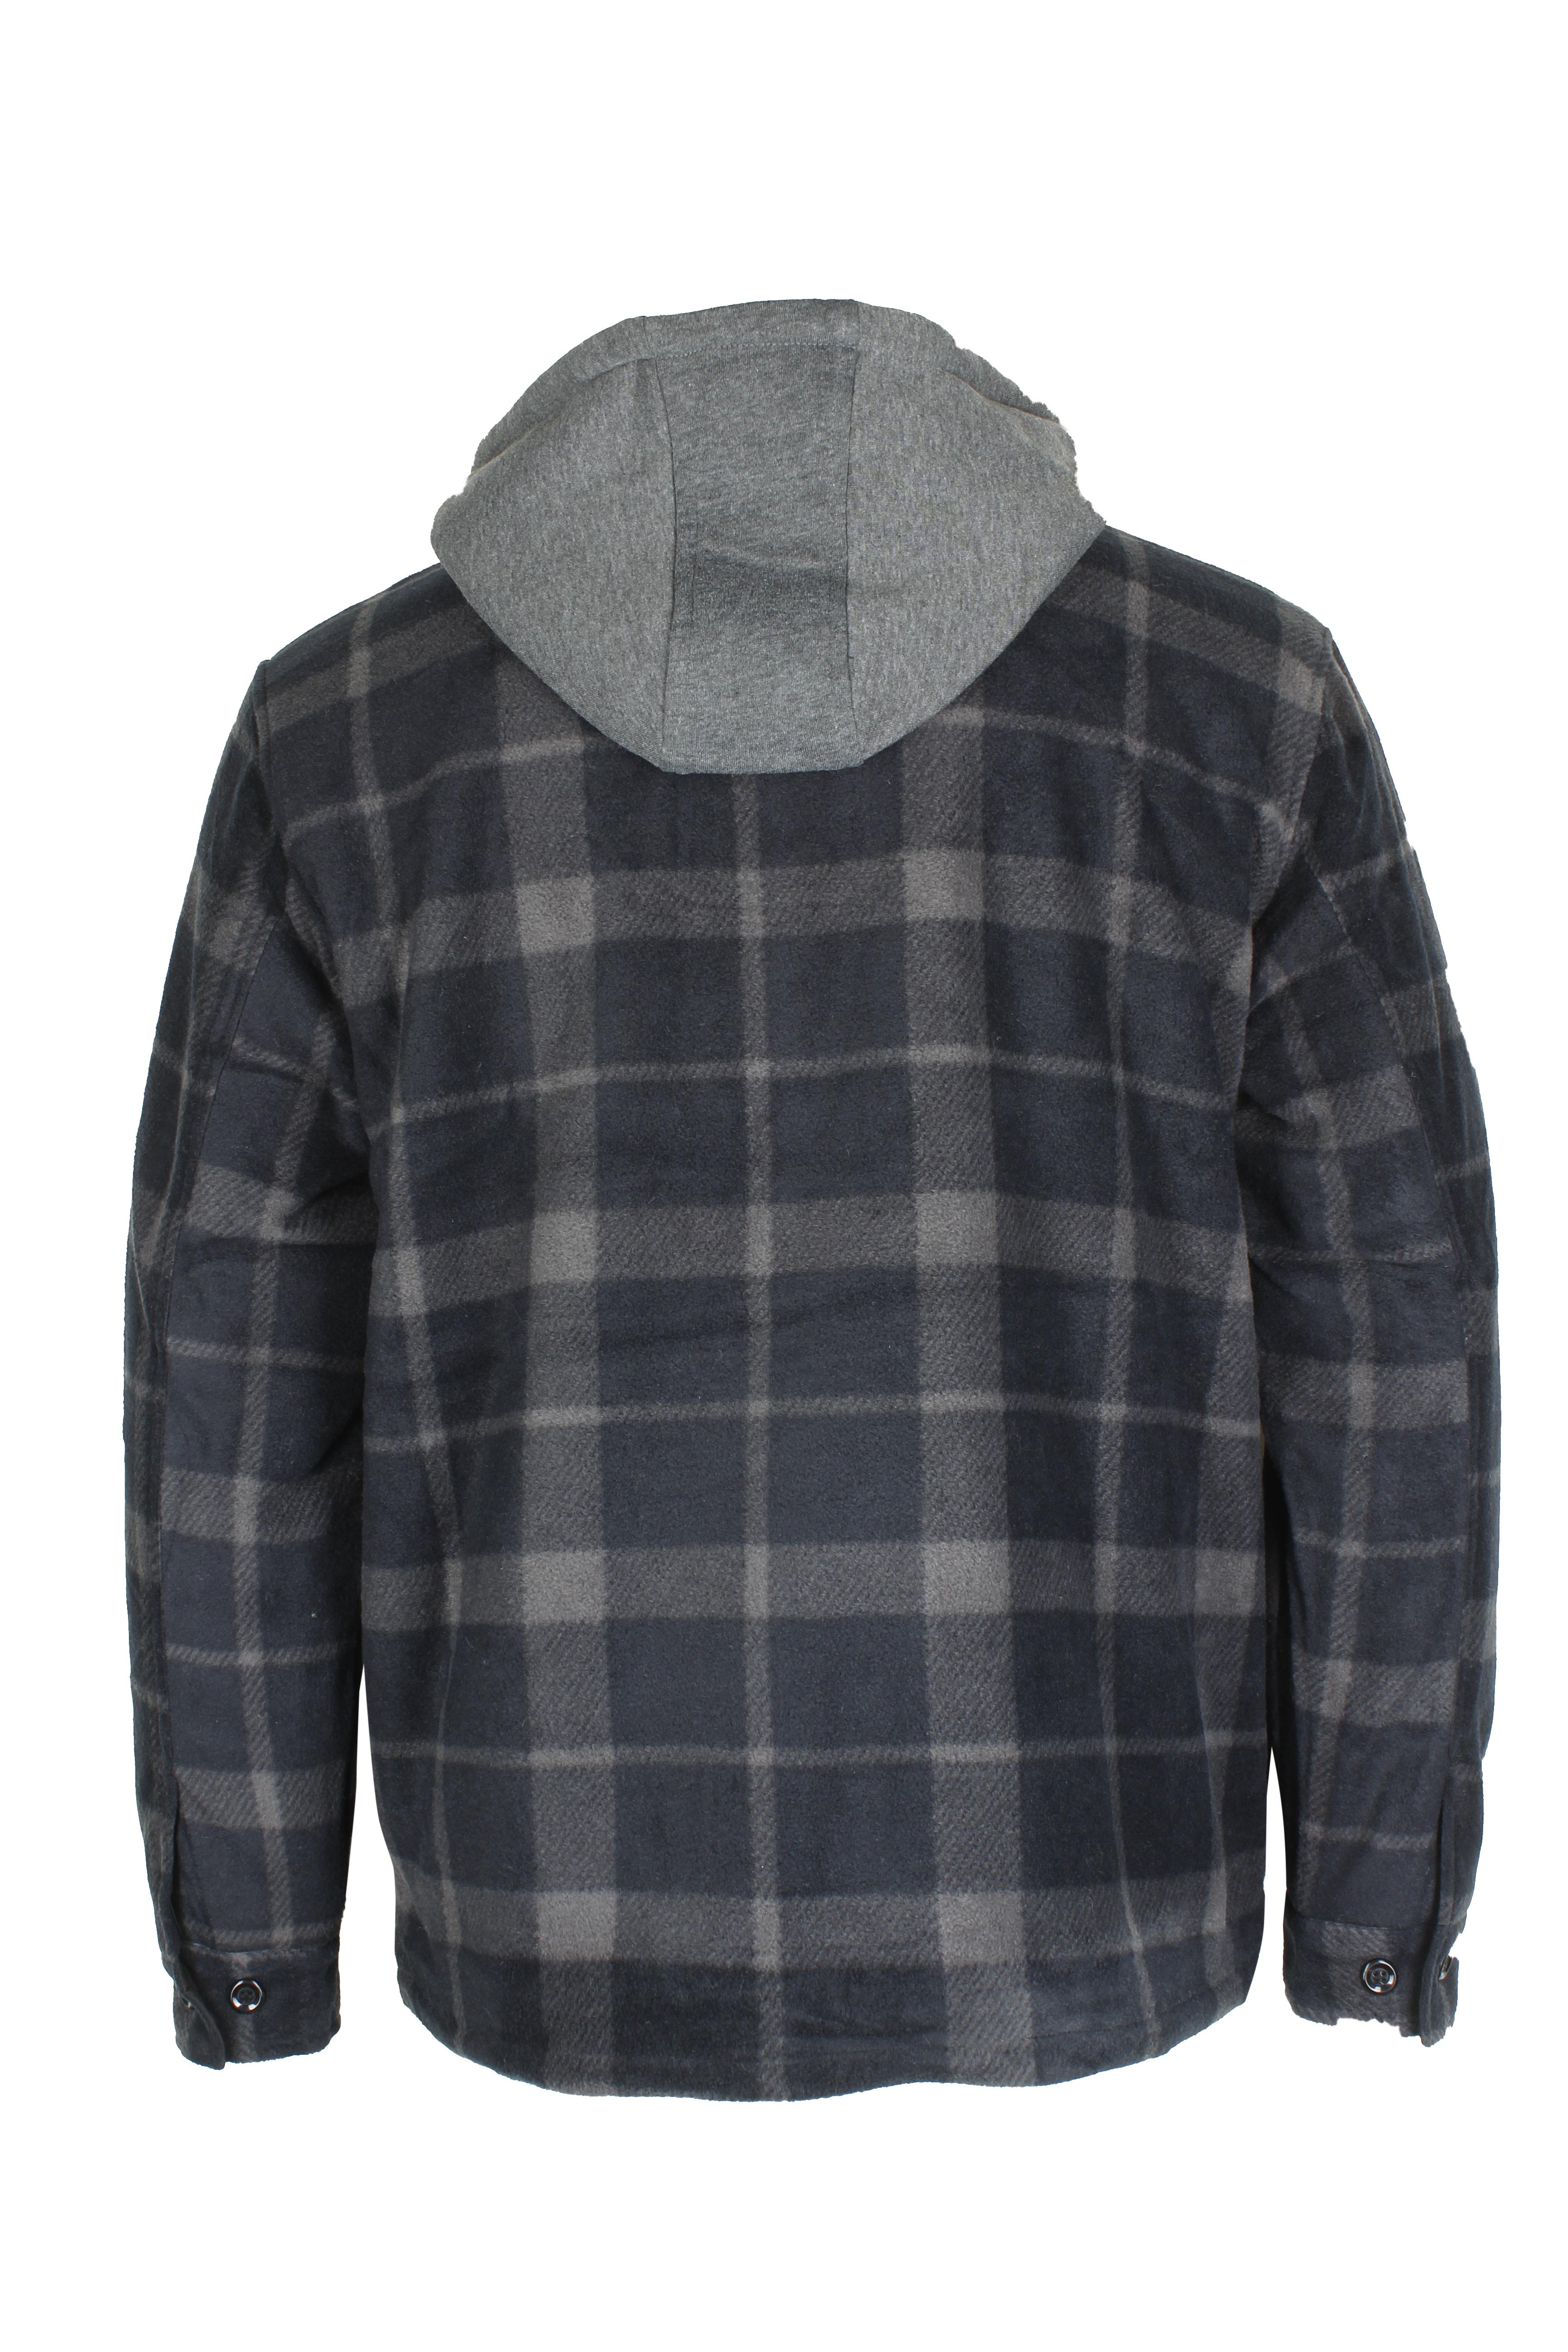 Maxxsel-Men-039-s-Sherpa-Lined-Plaid-Polar-Fleece-Flannel-Zip-Up-Hooded-Shirt-Jacket thumbnail 4